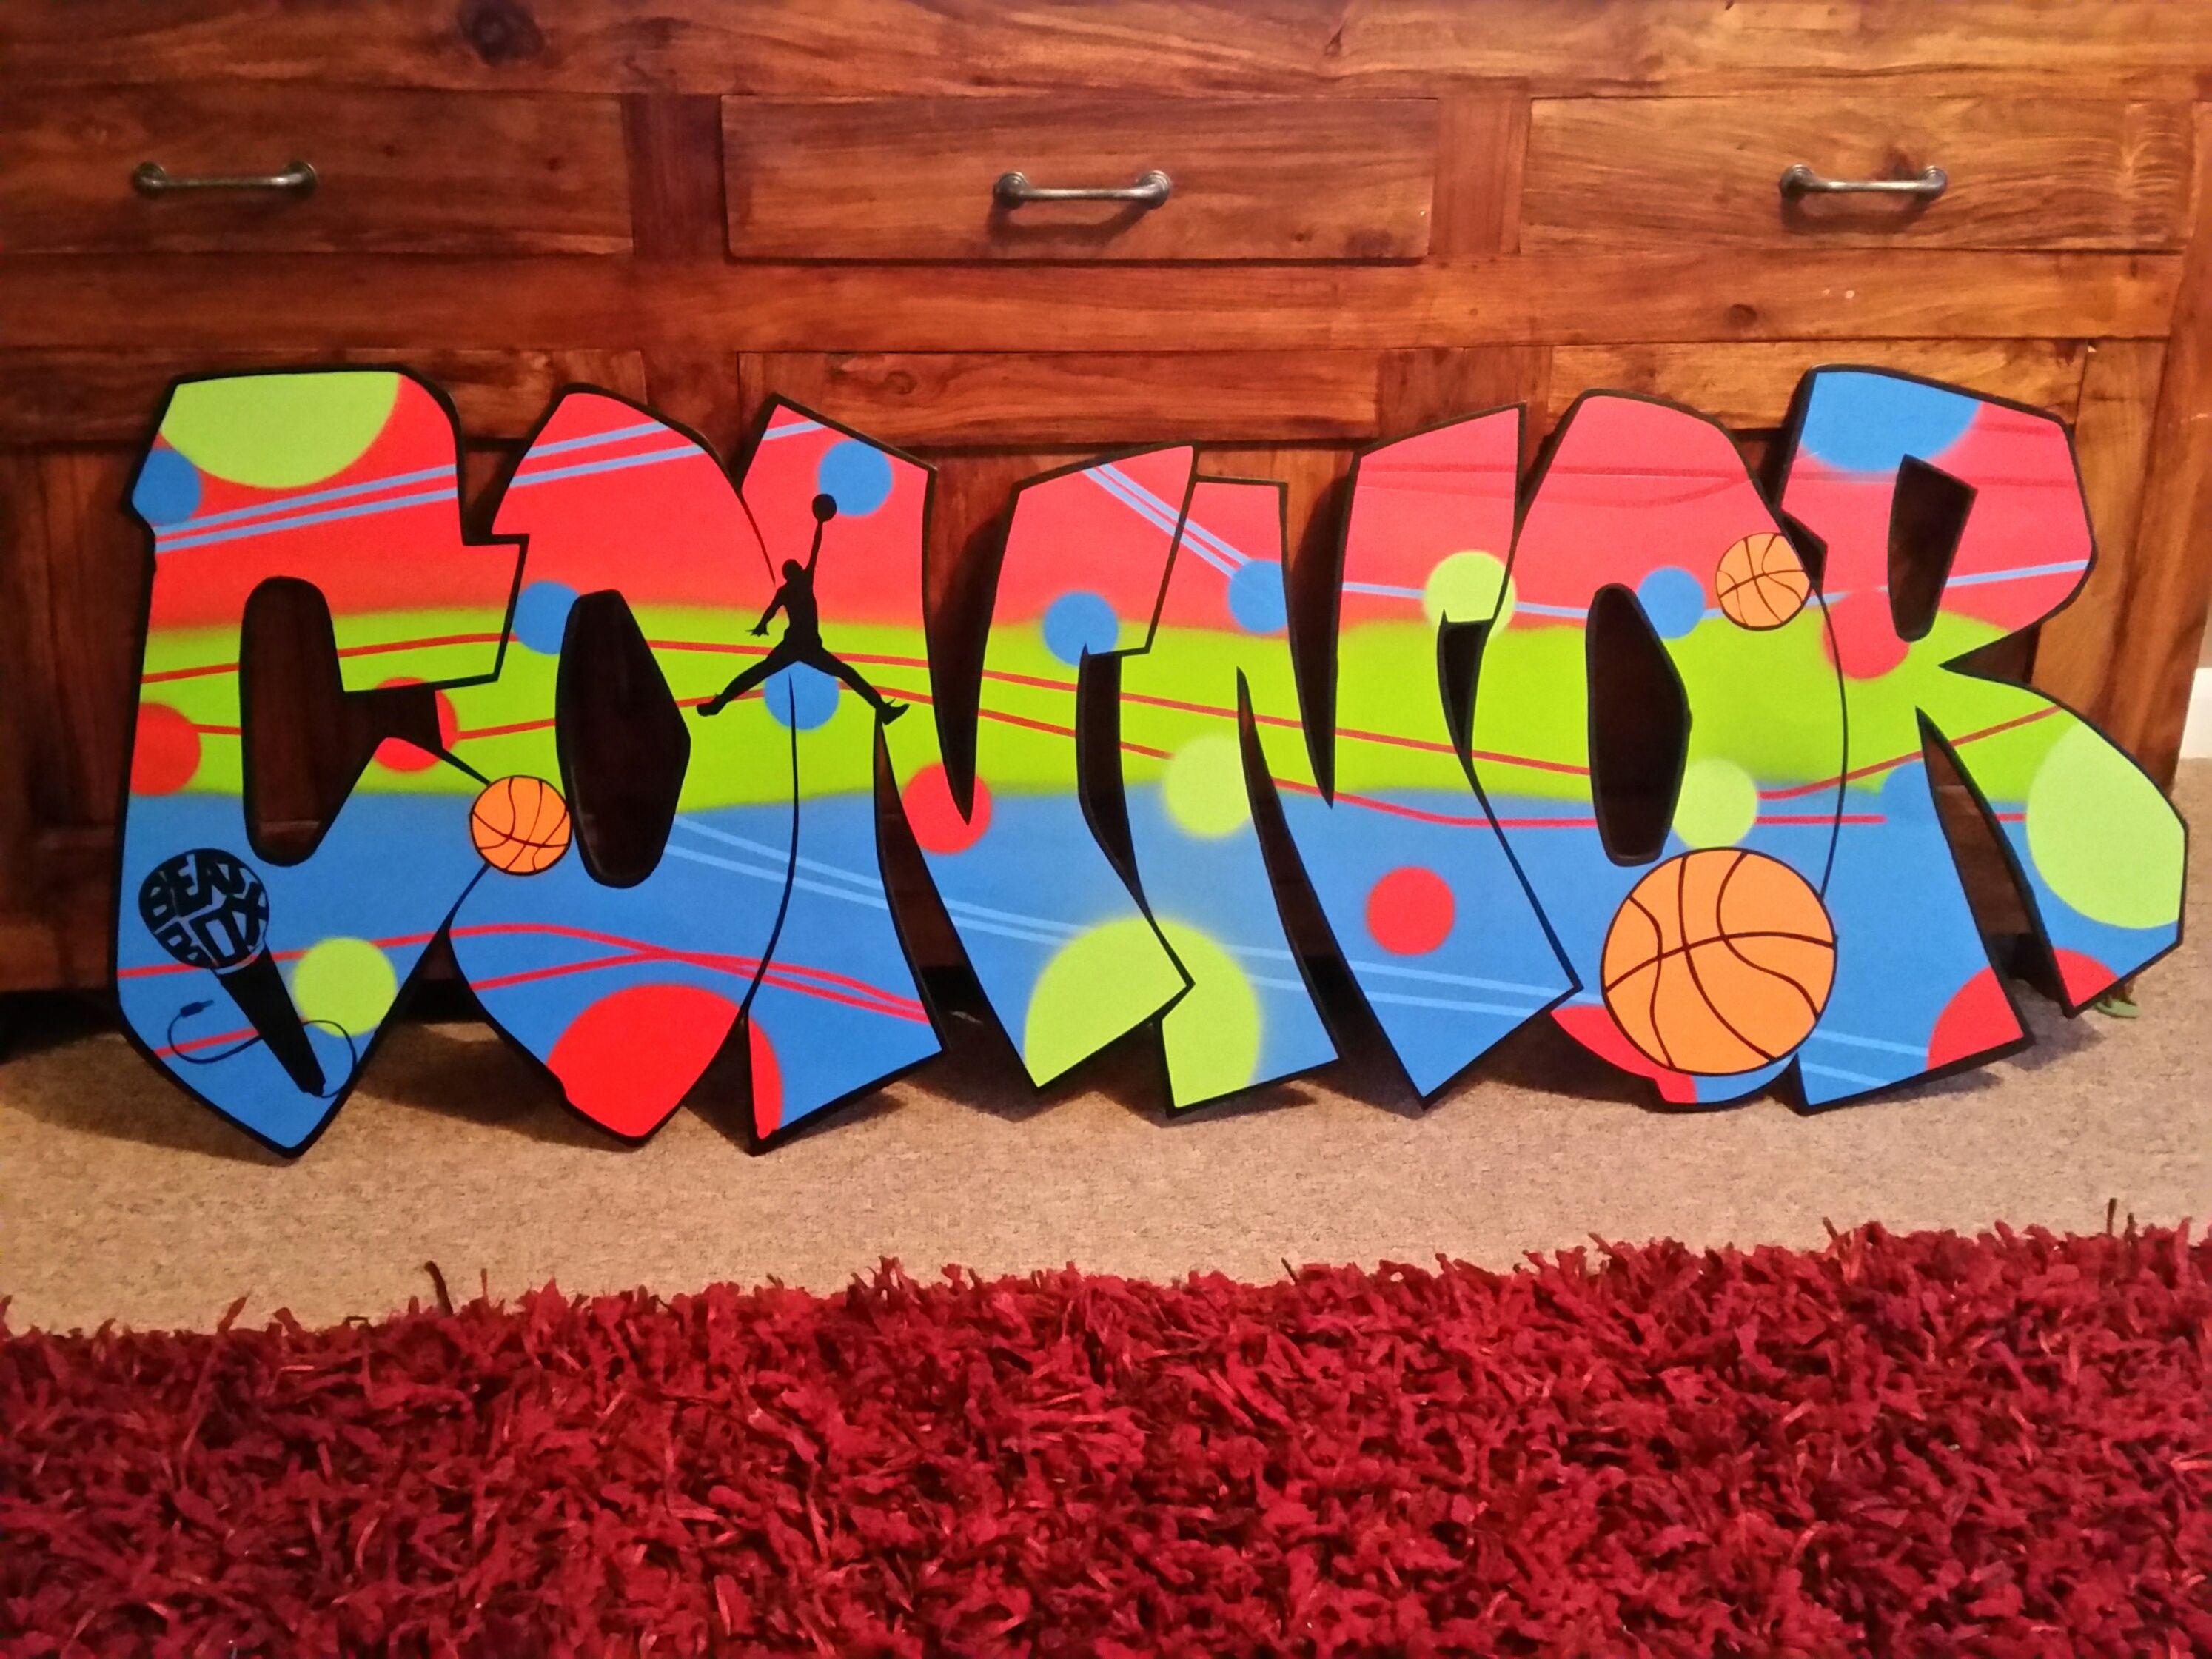 Connor graffiti name | Graffiti lettering, Doodle art drawing ...